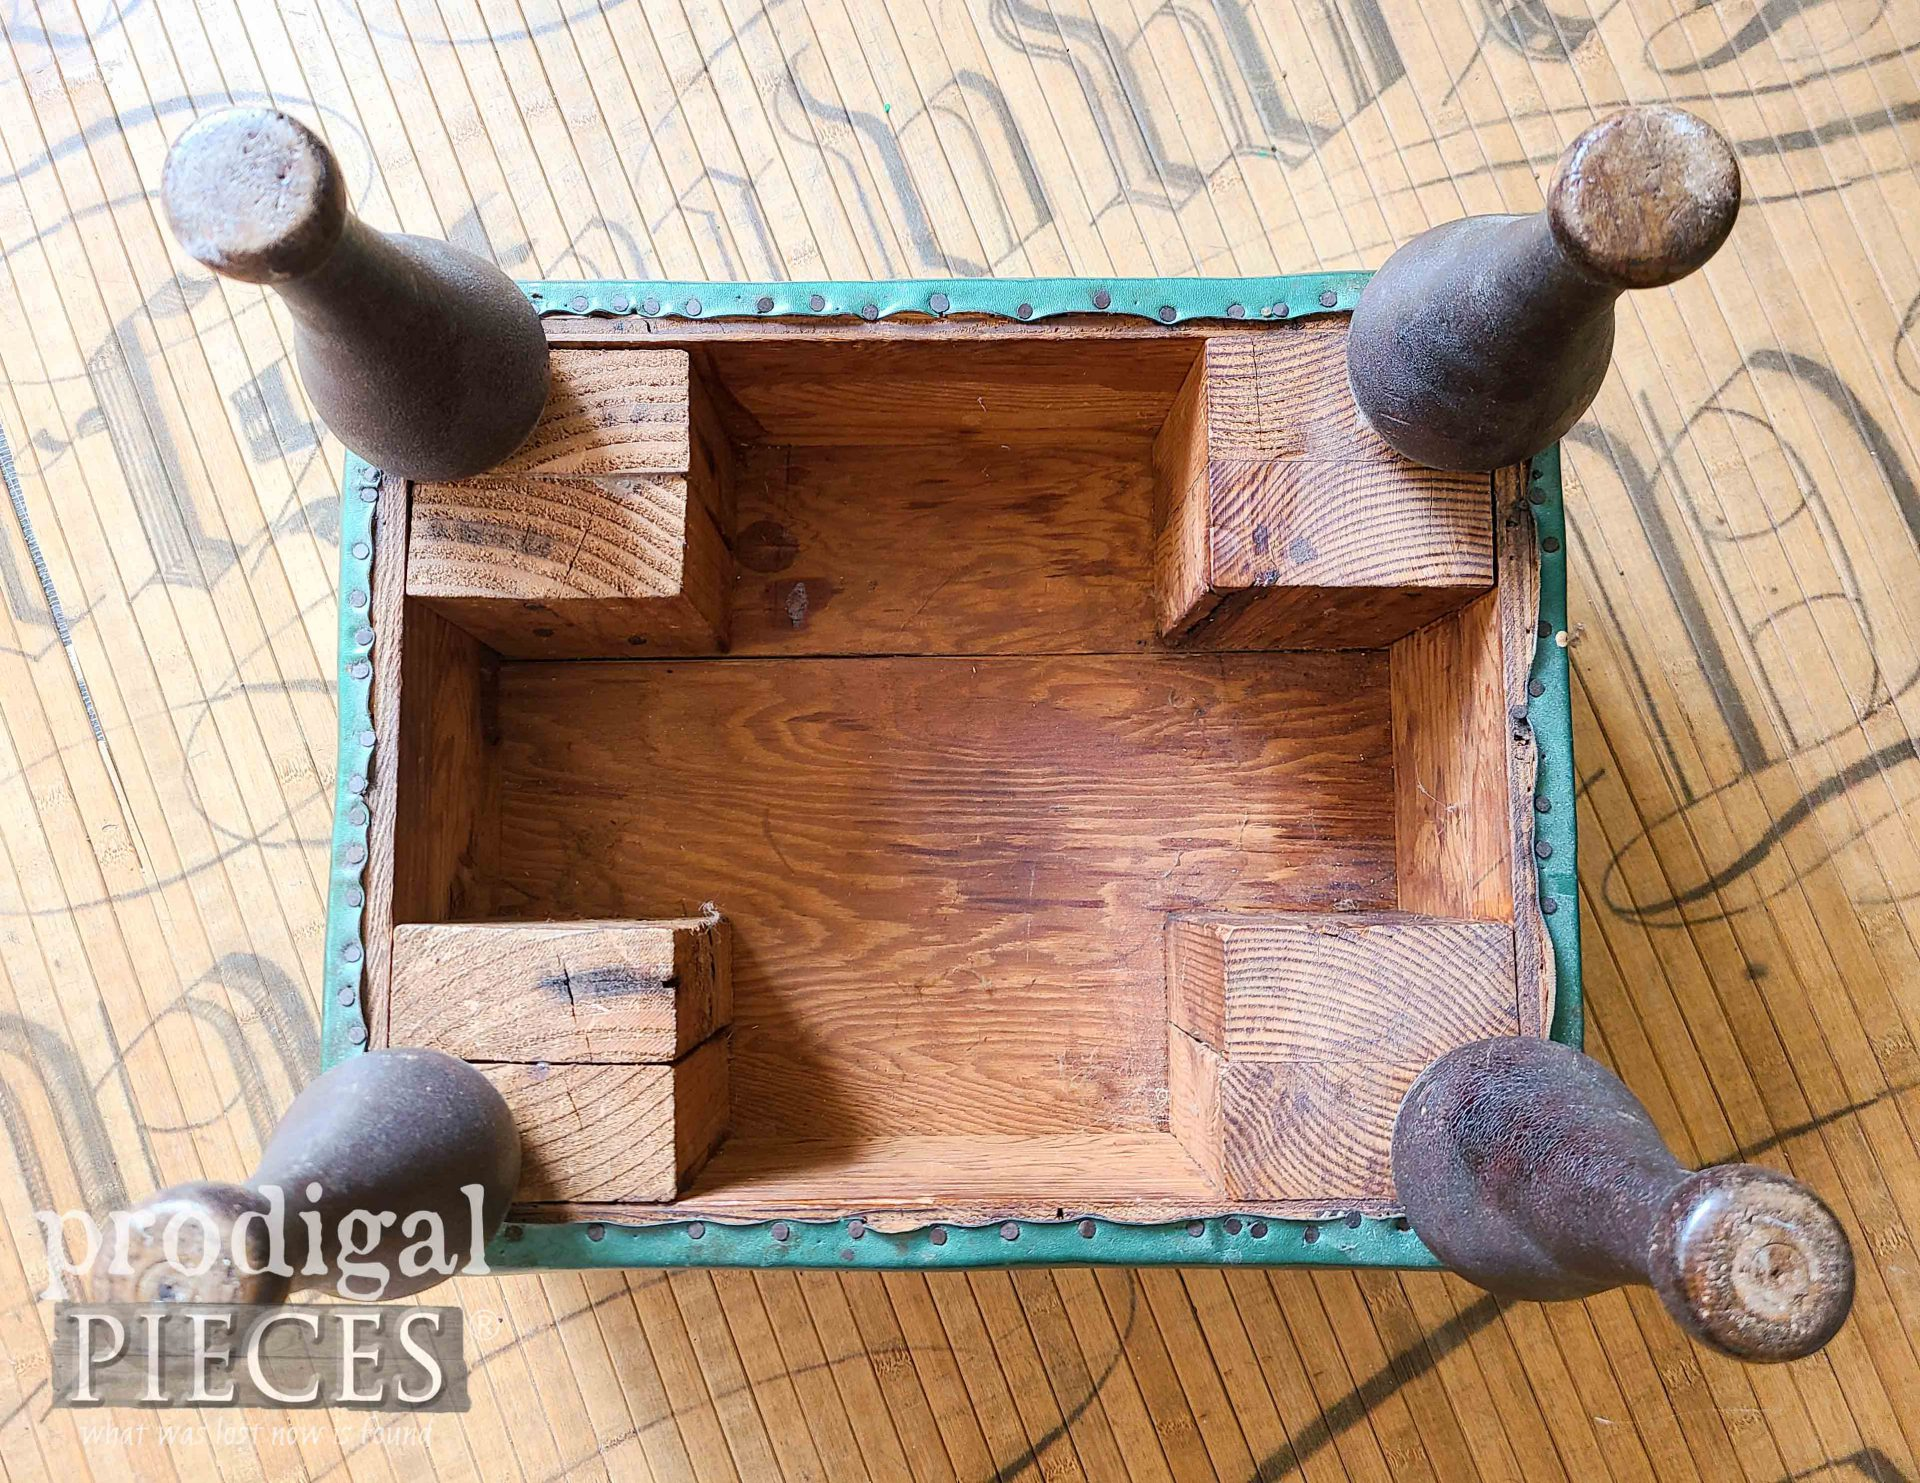 Vintage Vinyl Footstool Underside Before Makeover | prodigalpieces.com